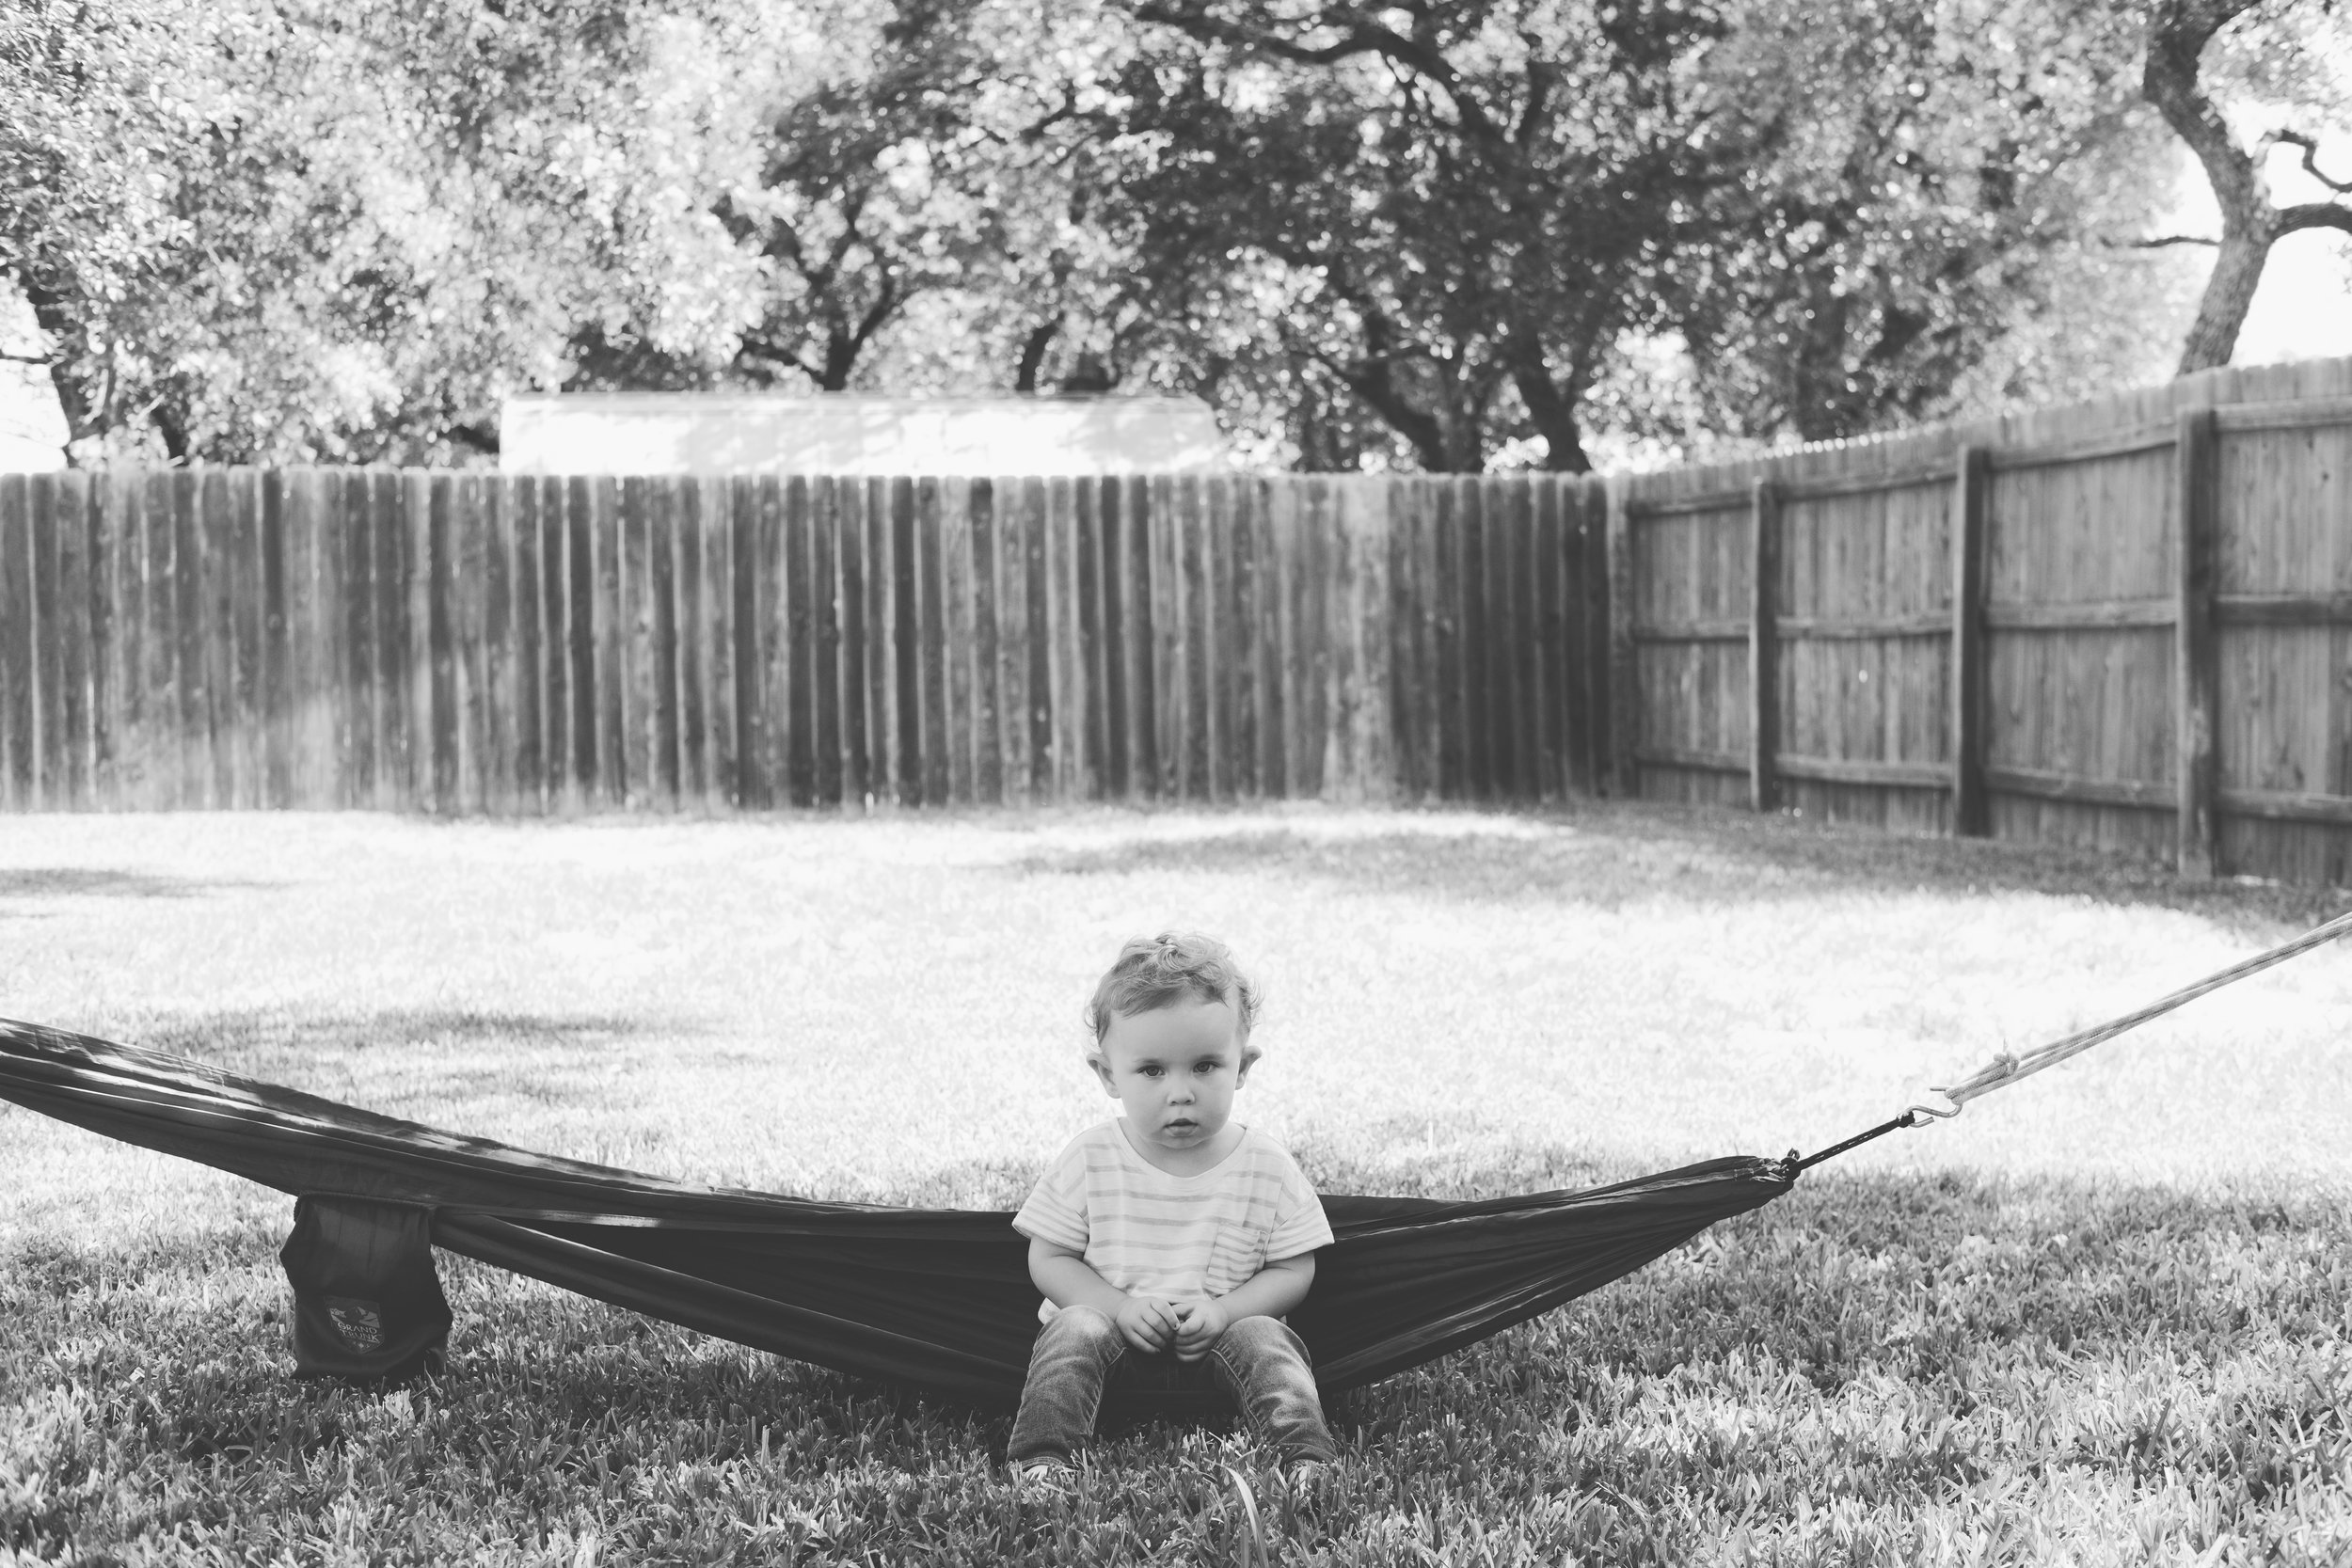 Child sitting in hammock in yard